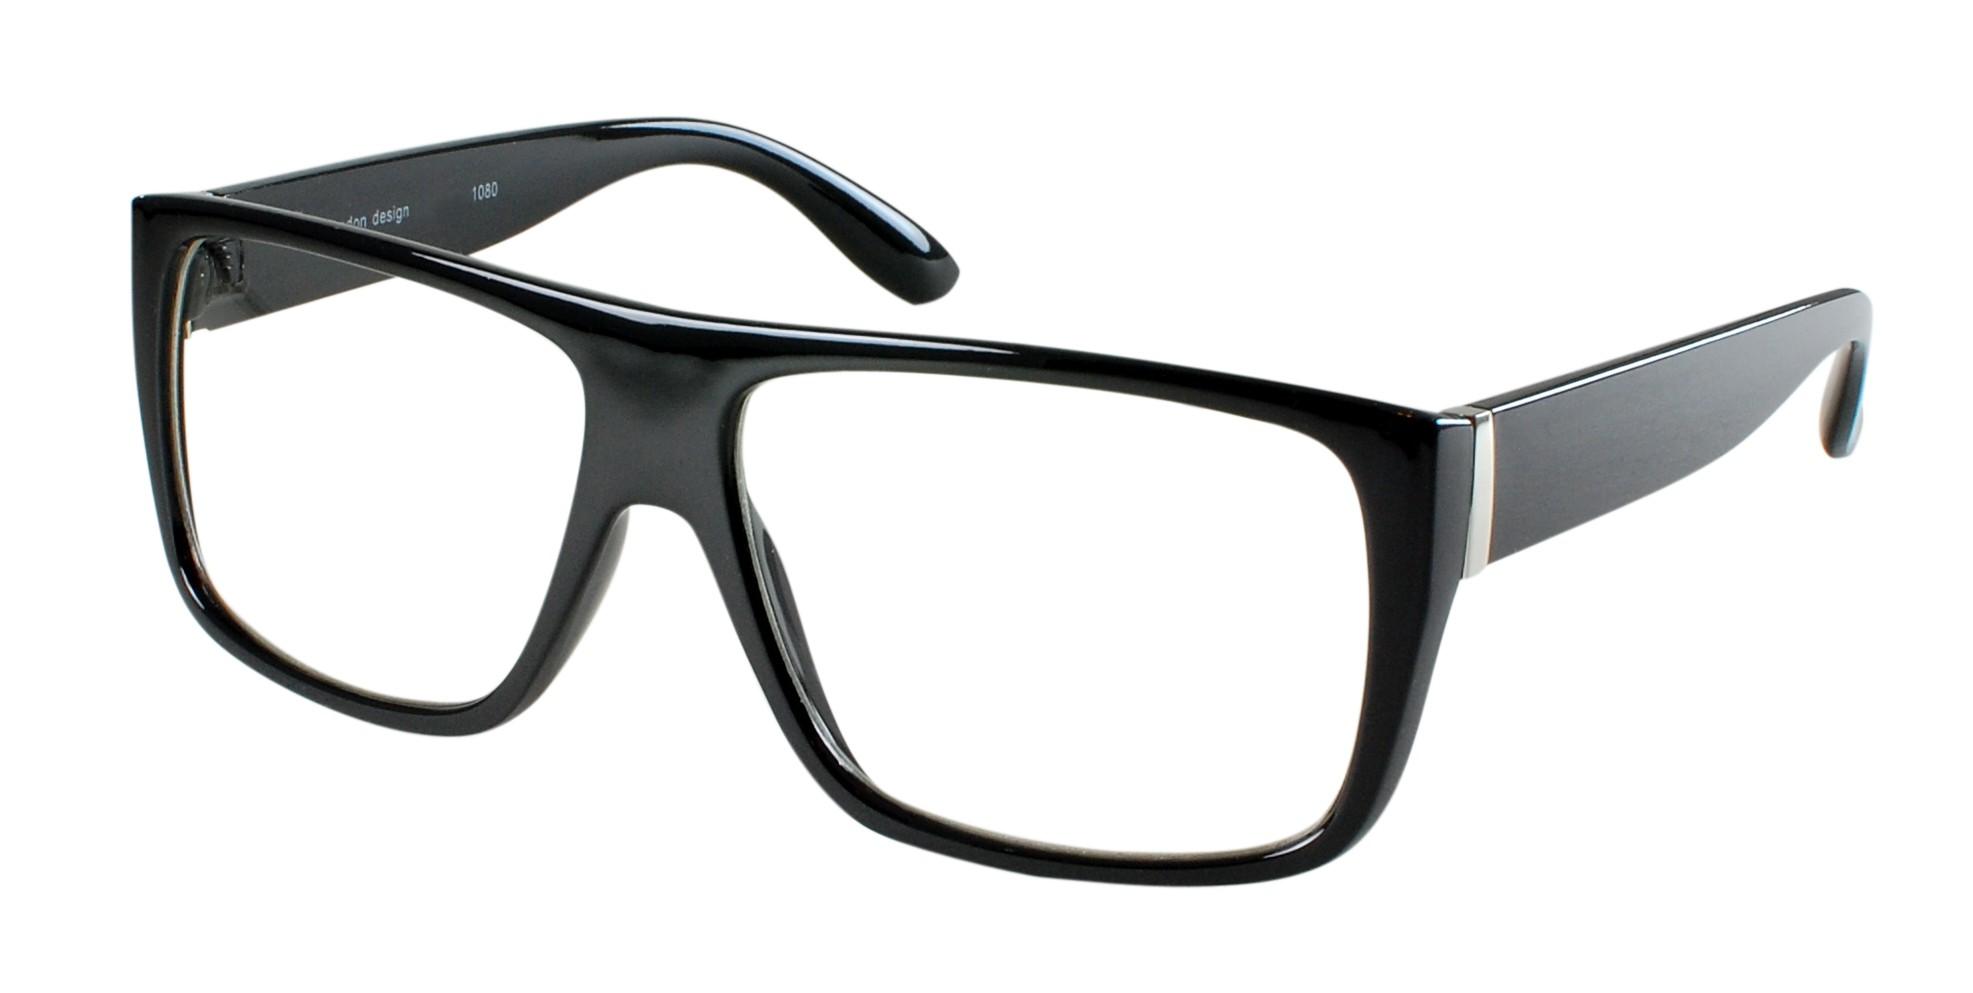 1973x993 Glasses Clipart The Cliparts